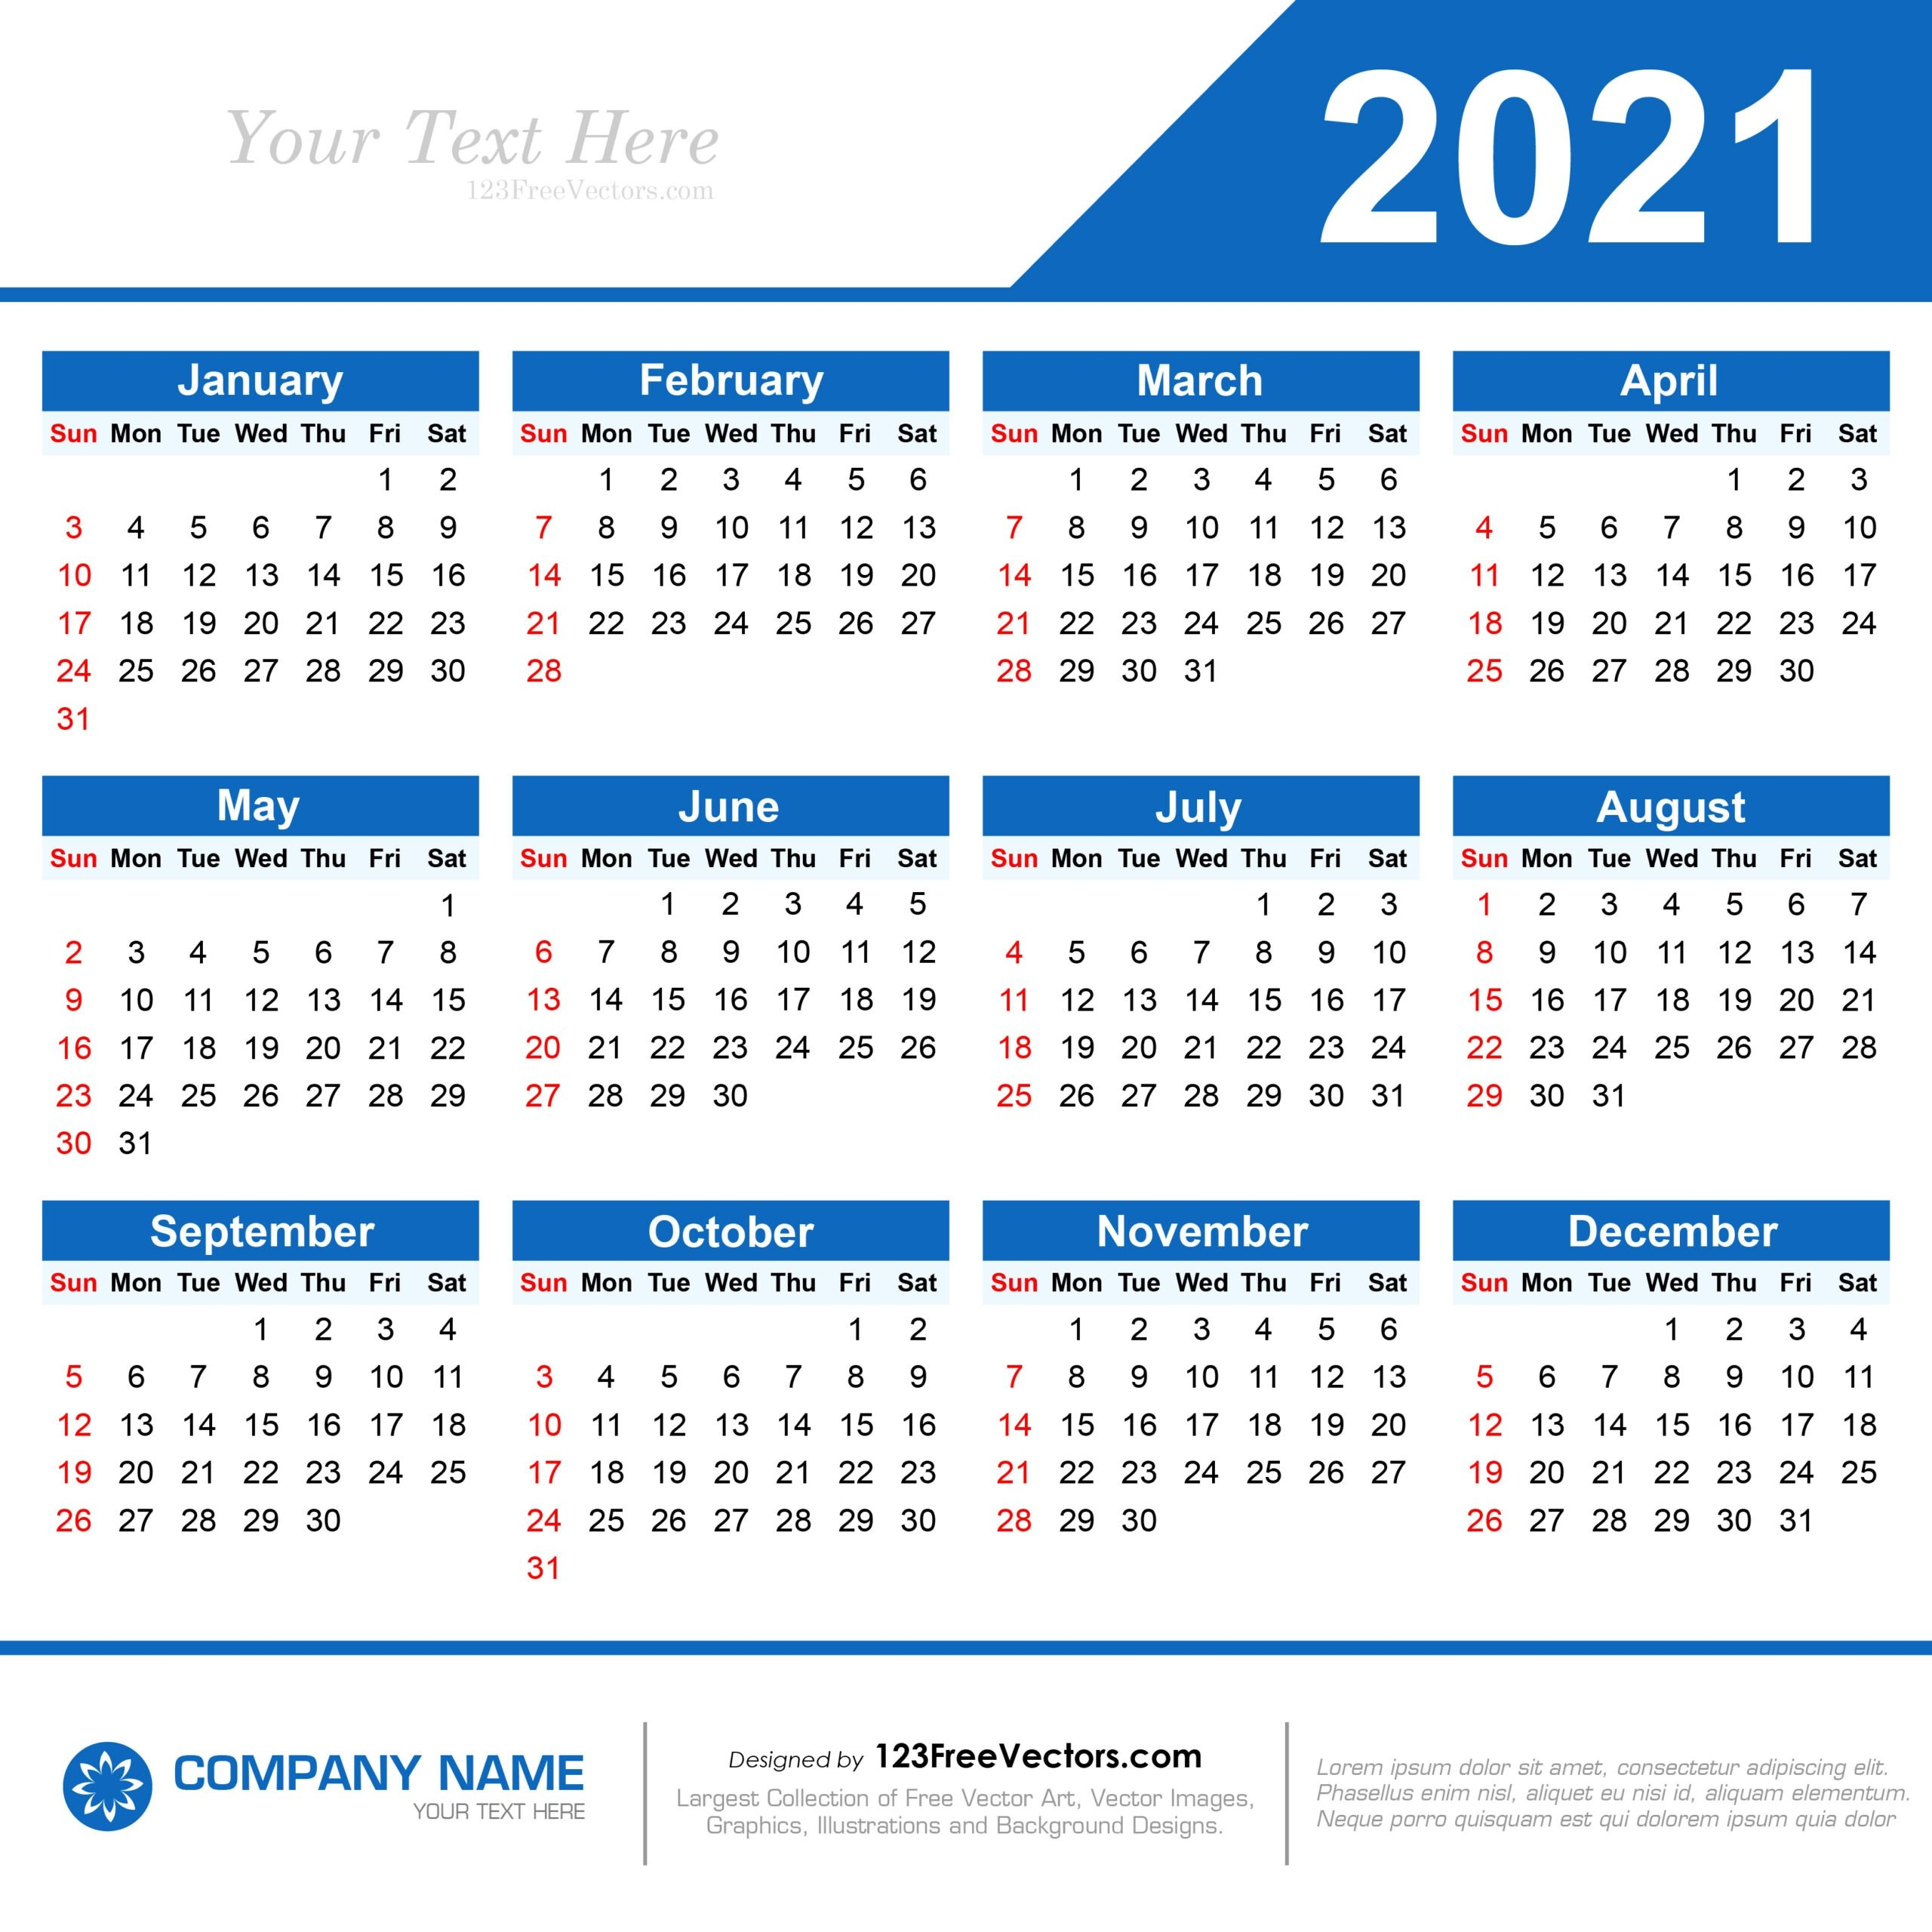 Calendar 2021 Psd File Free Download - Printablecalendarr inside Church Calendar 2021 Psd Image